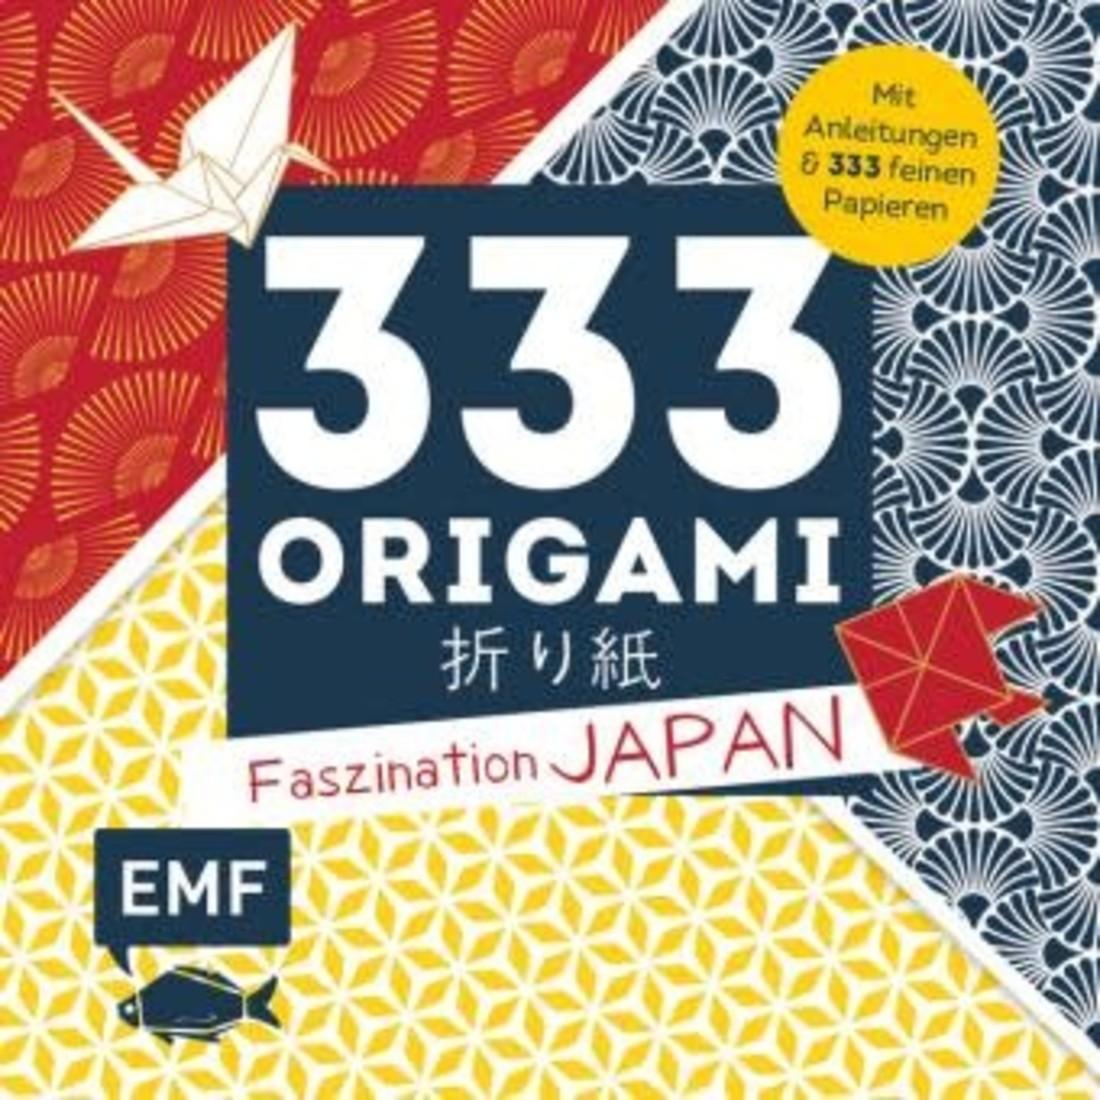 333 Origami «Faszination Japan»